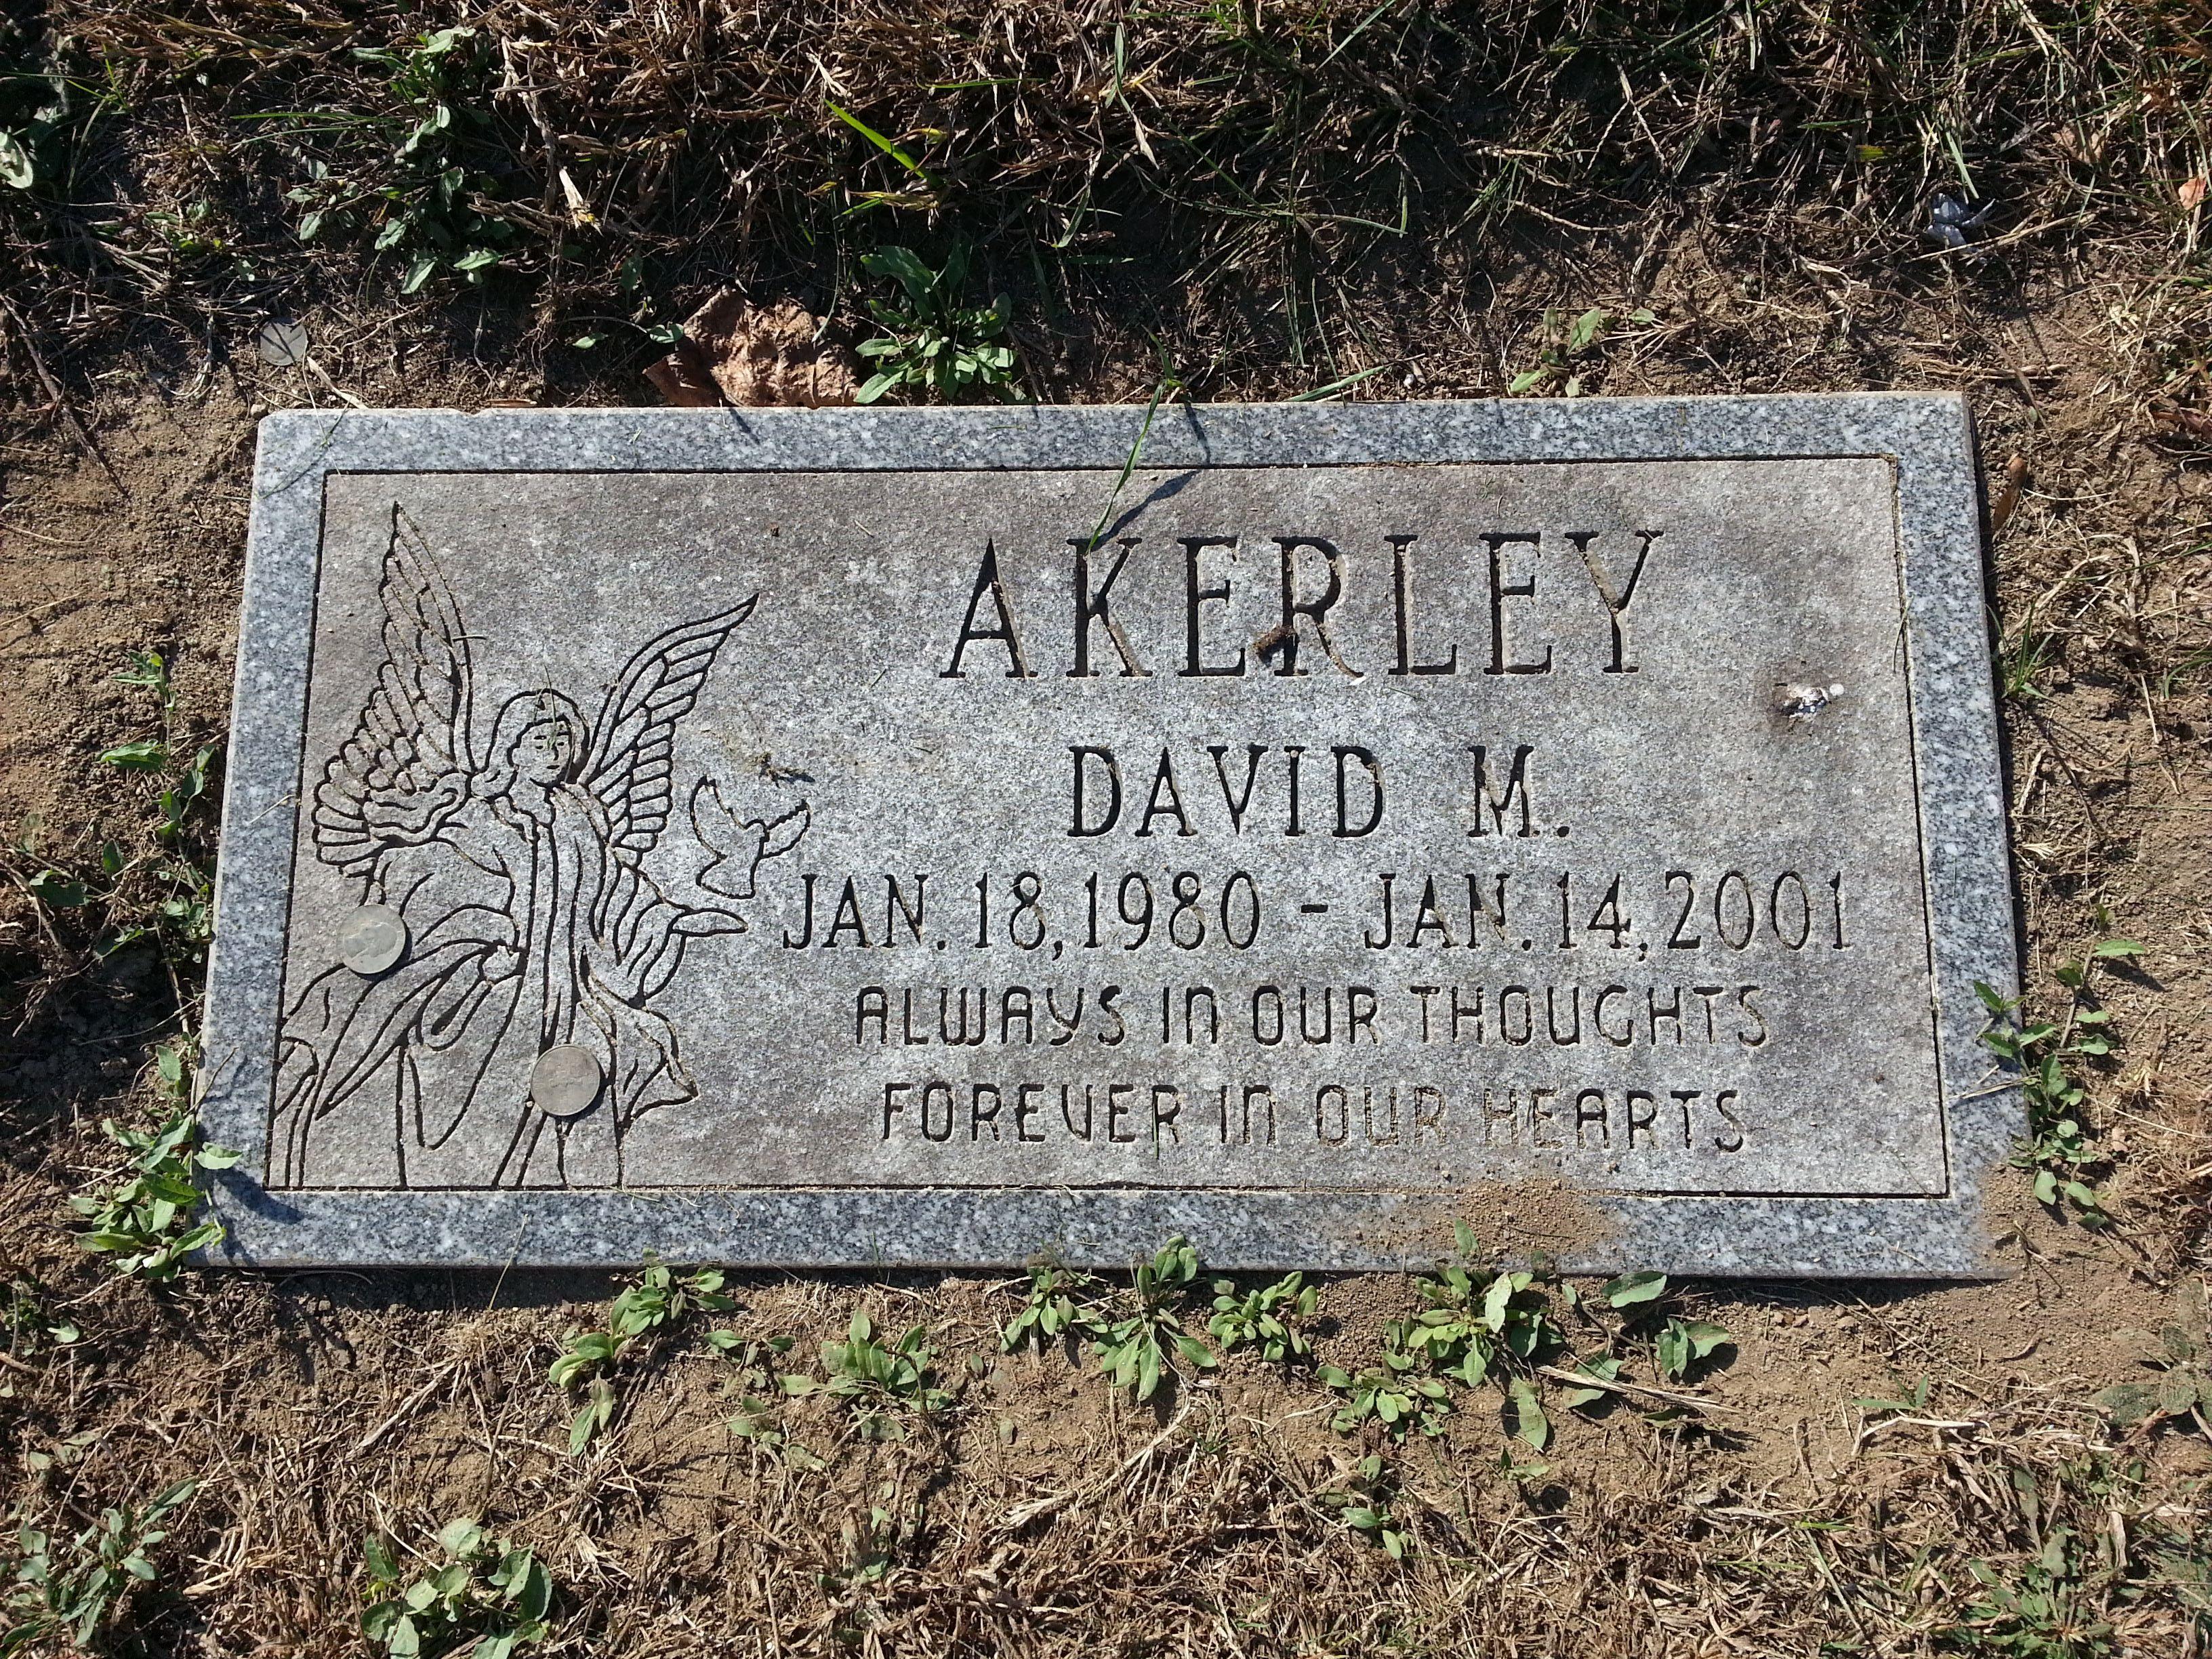 David M. Akerley